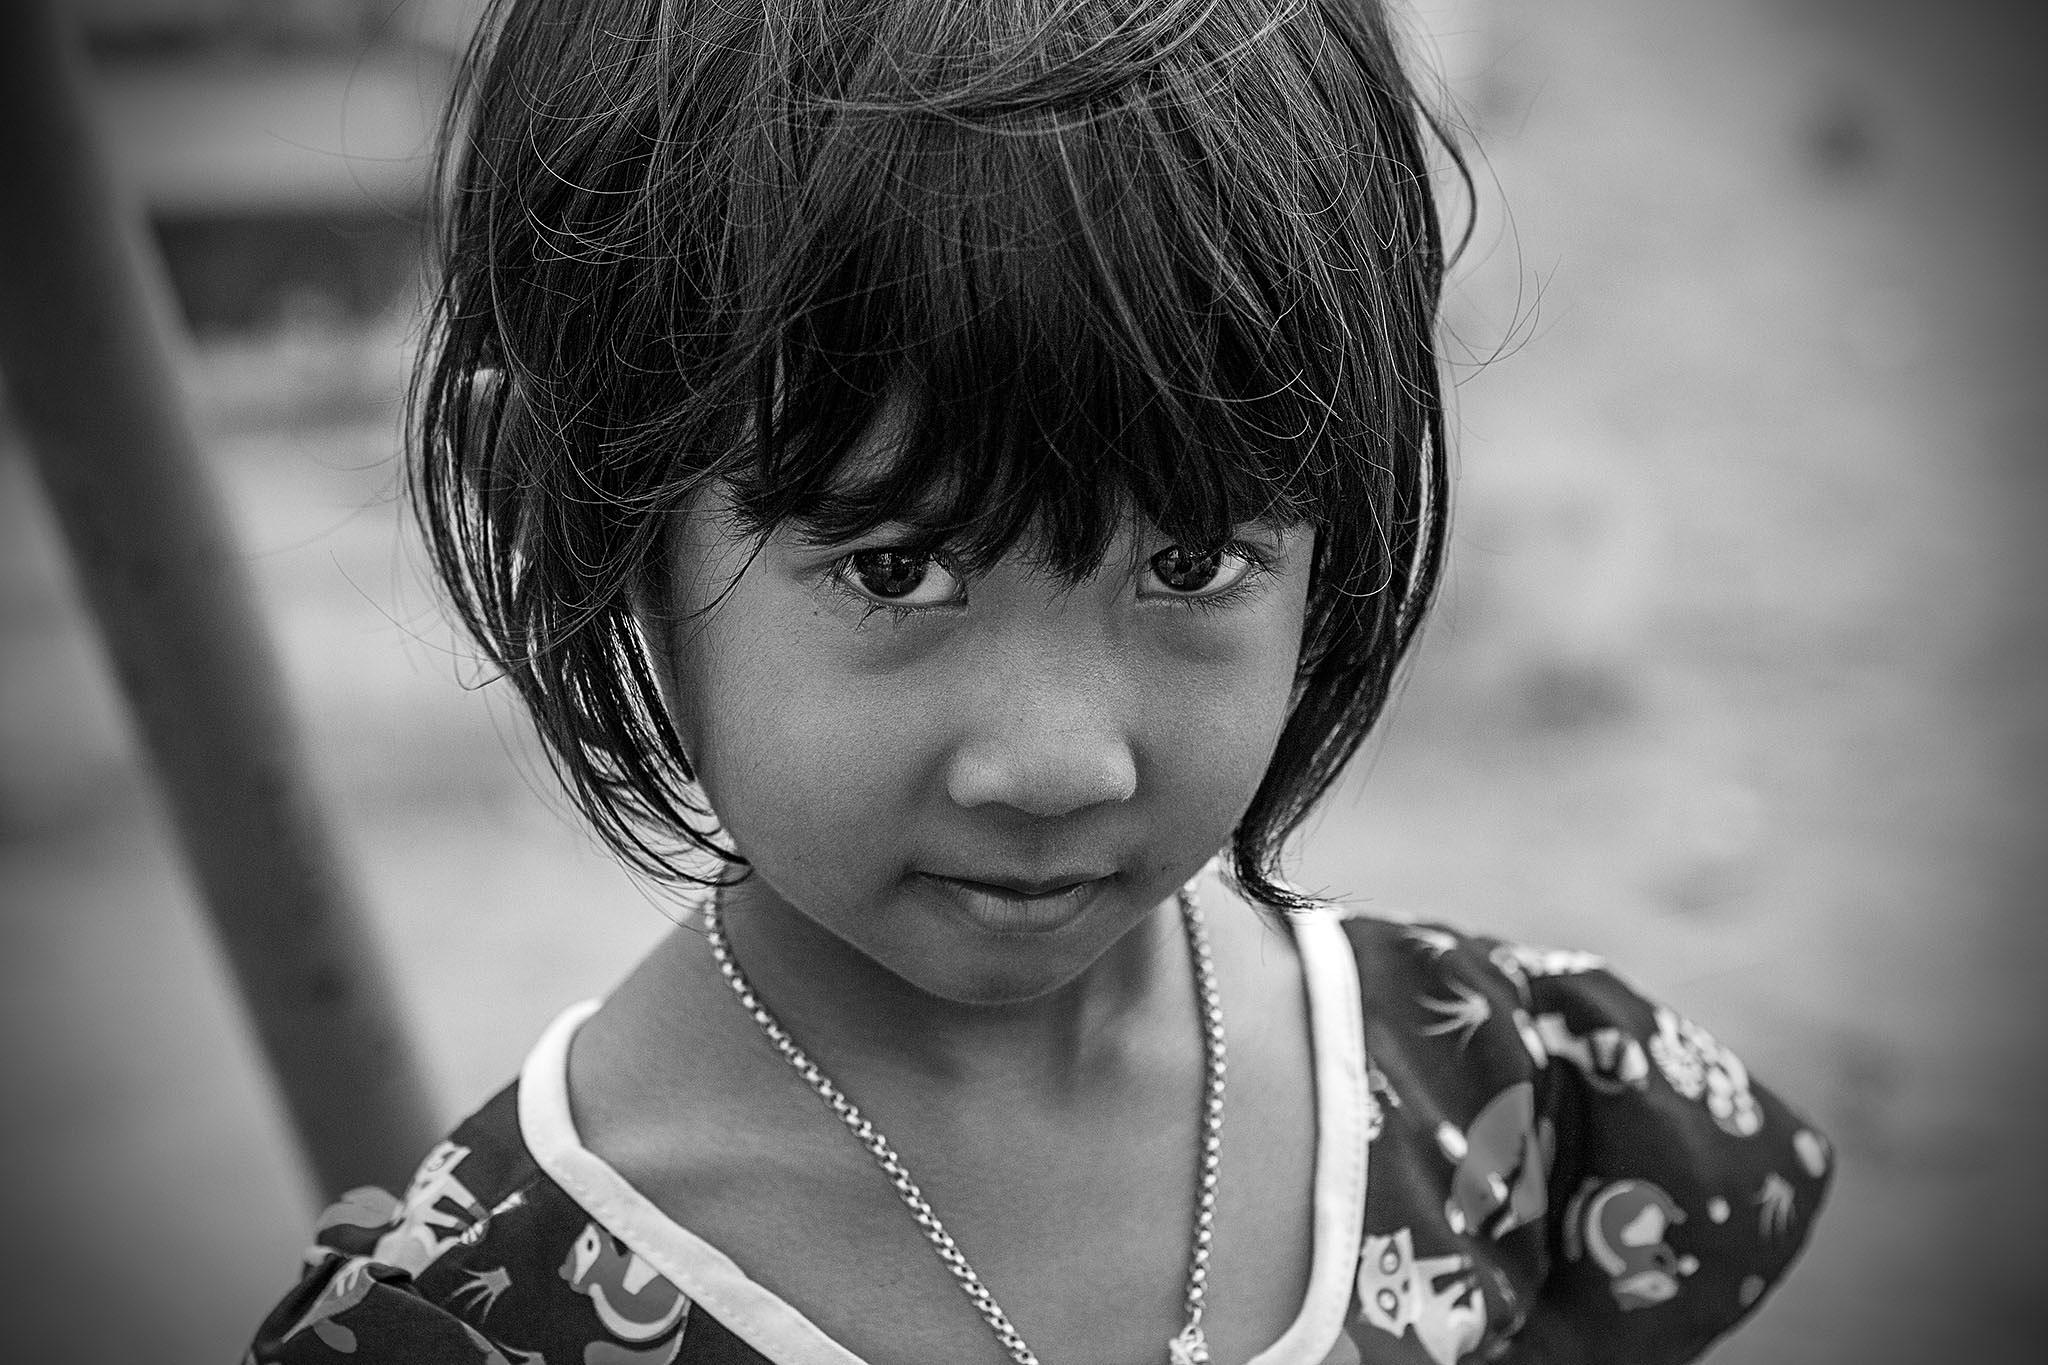 Kids from Kanchanaburi by Zeno Bresson